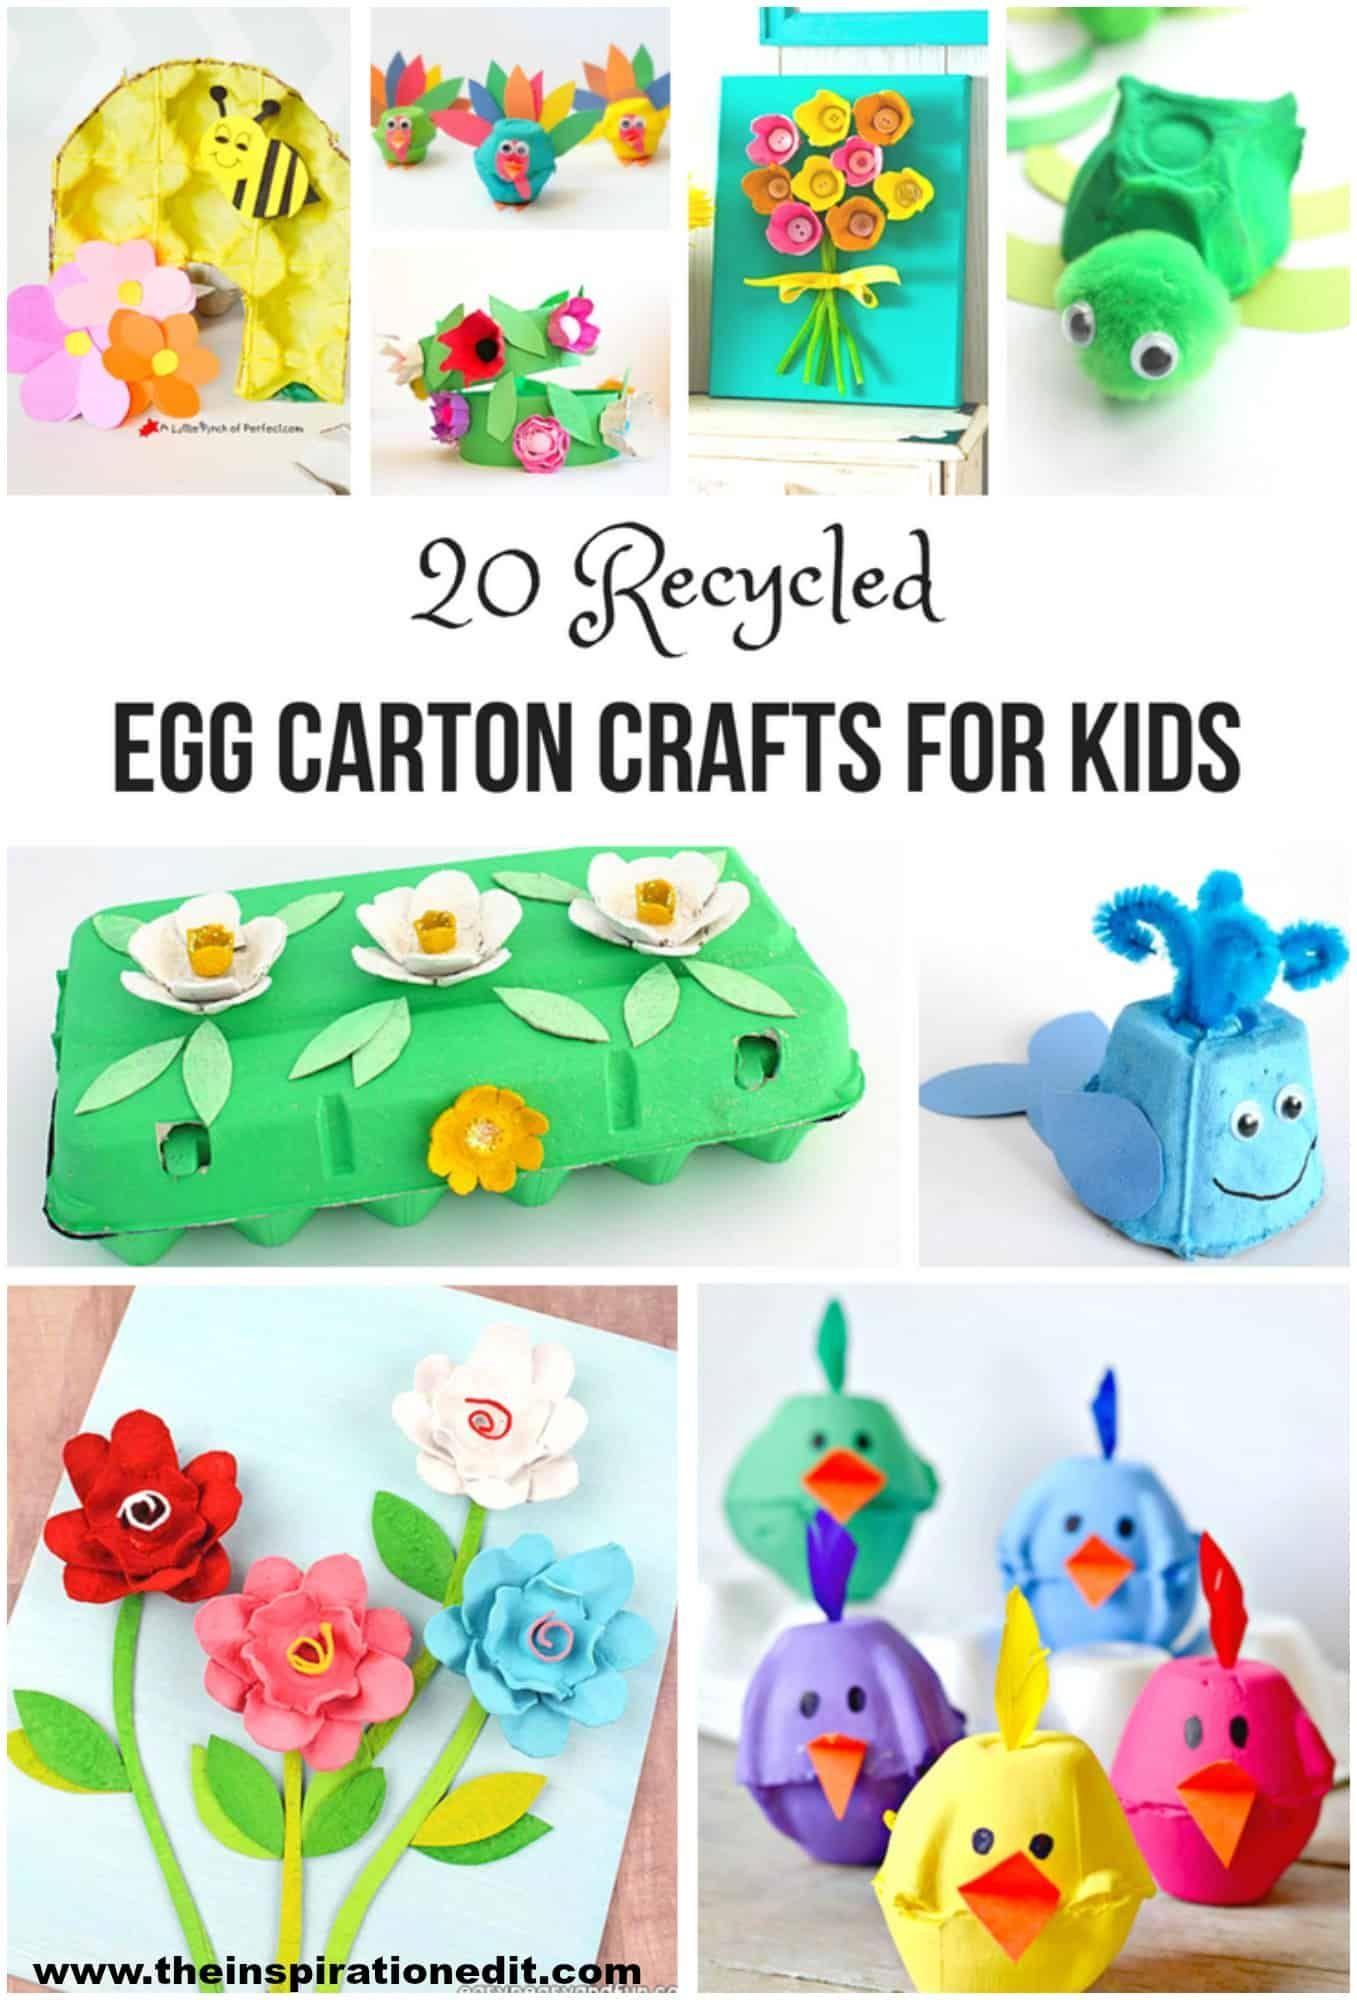 20 Recycled Egg Carton Crafts Egg Carton Crafts Easter Crafts